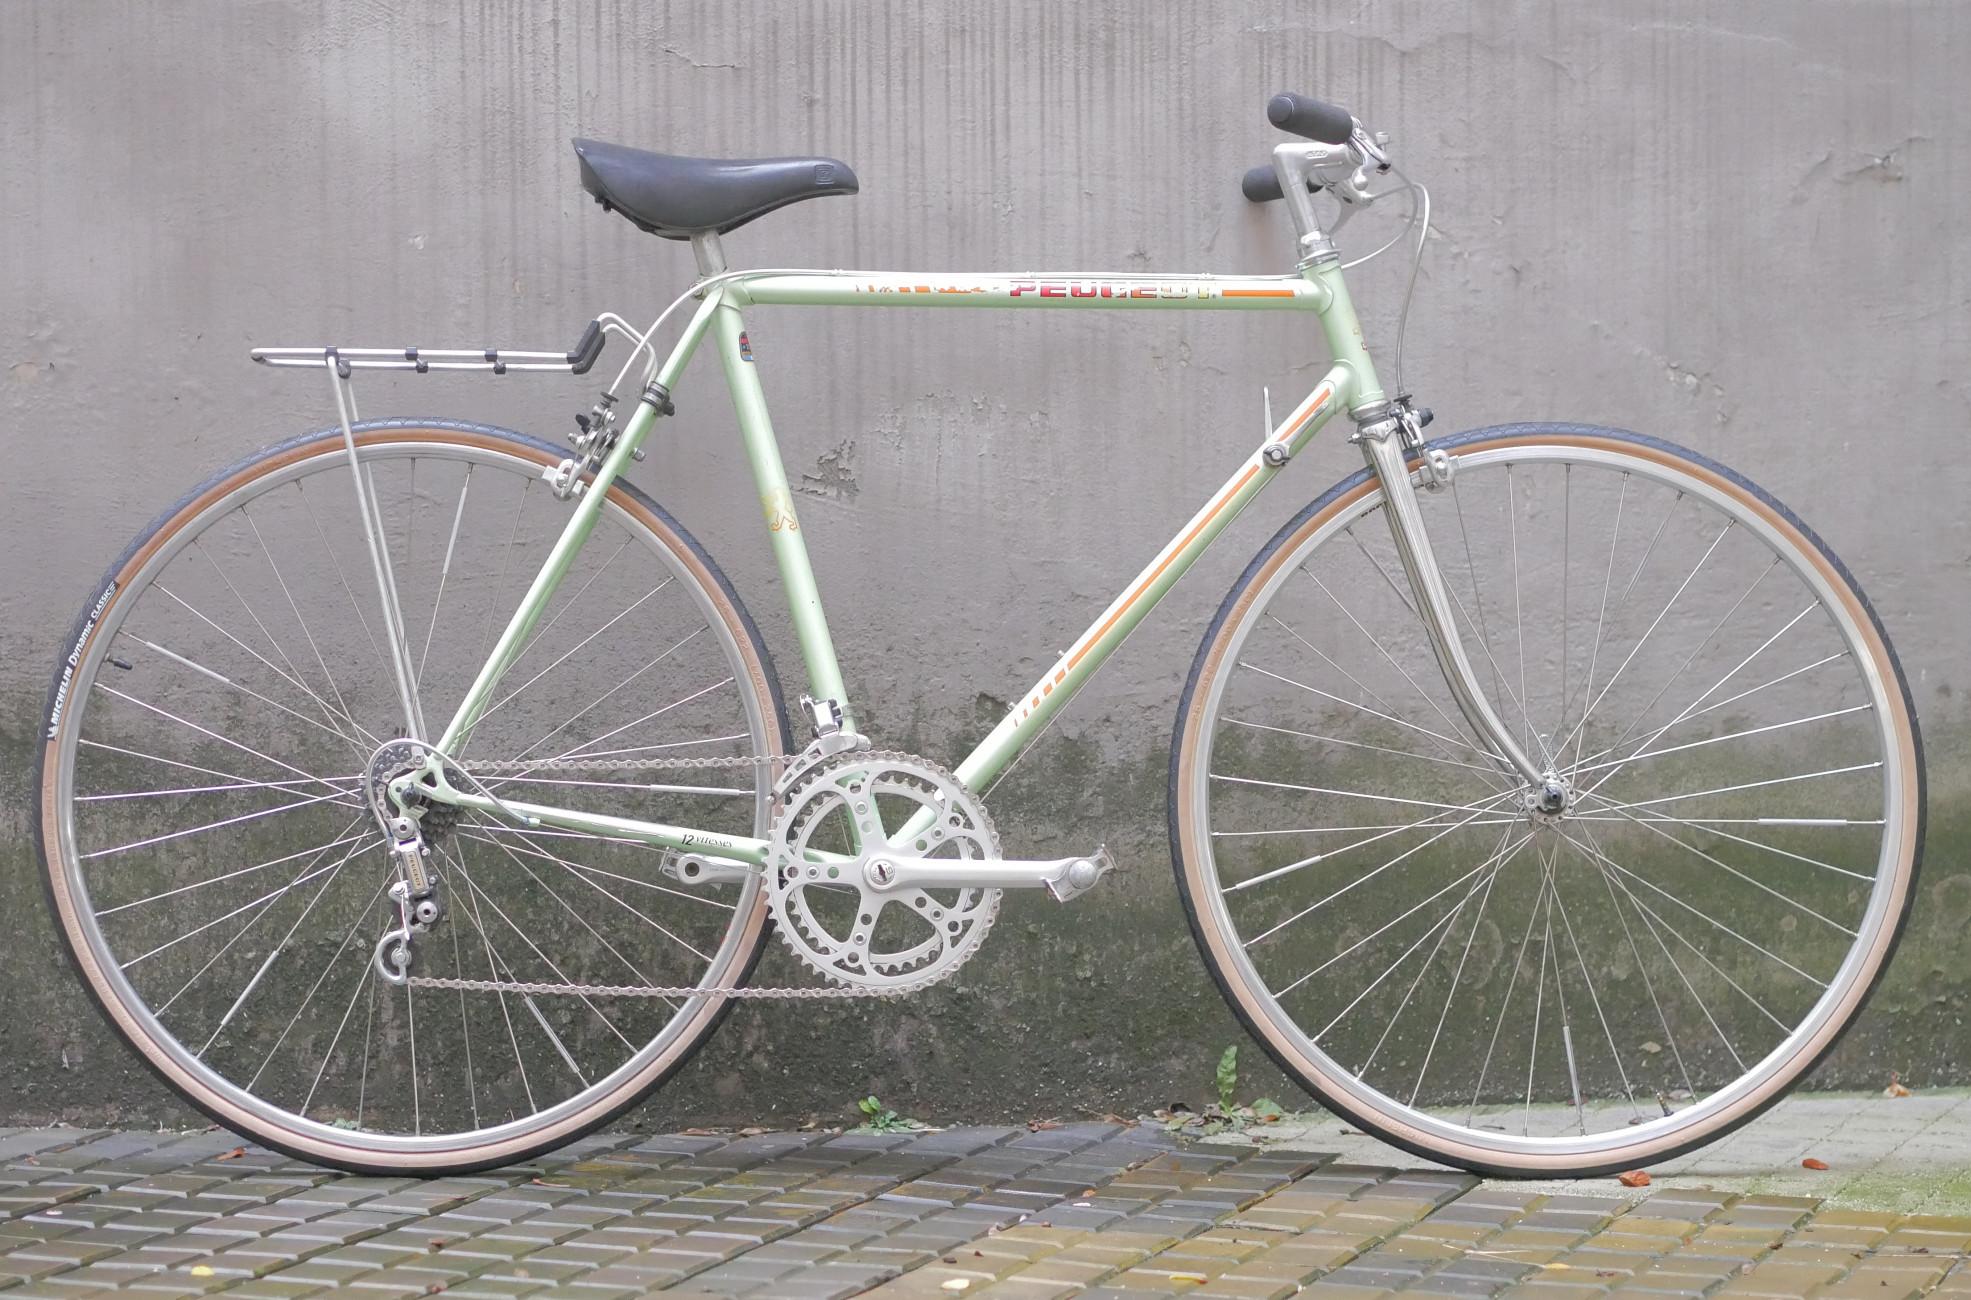 P1090026 e1557149036200 - Peugeot custom vintage bike